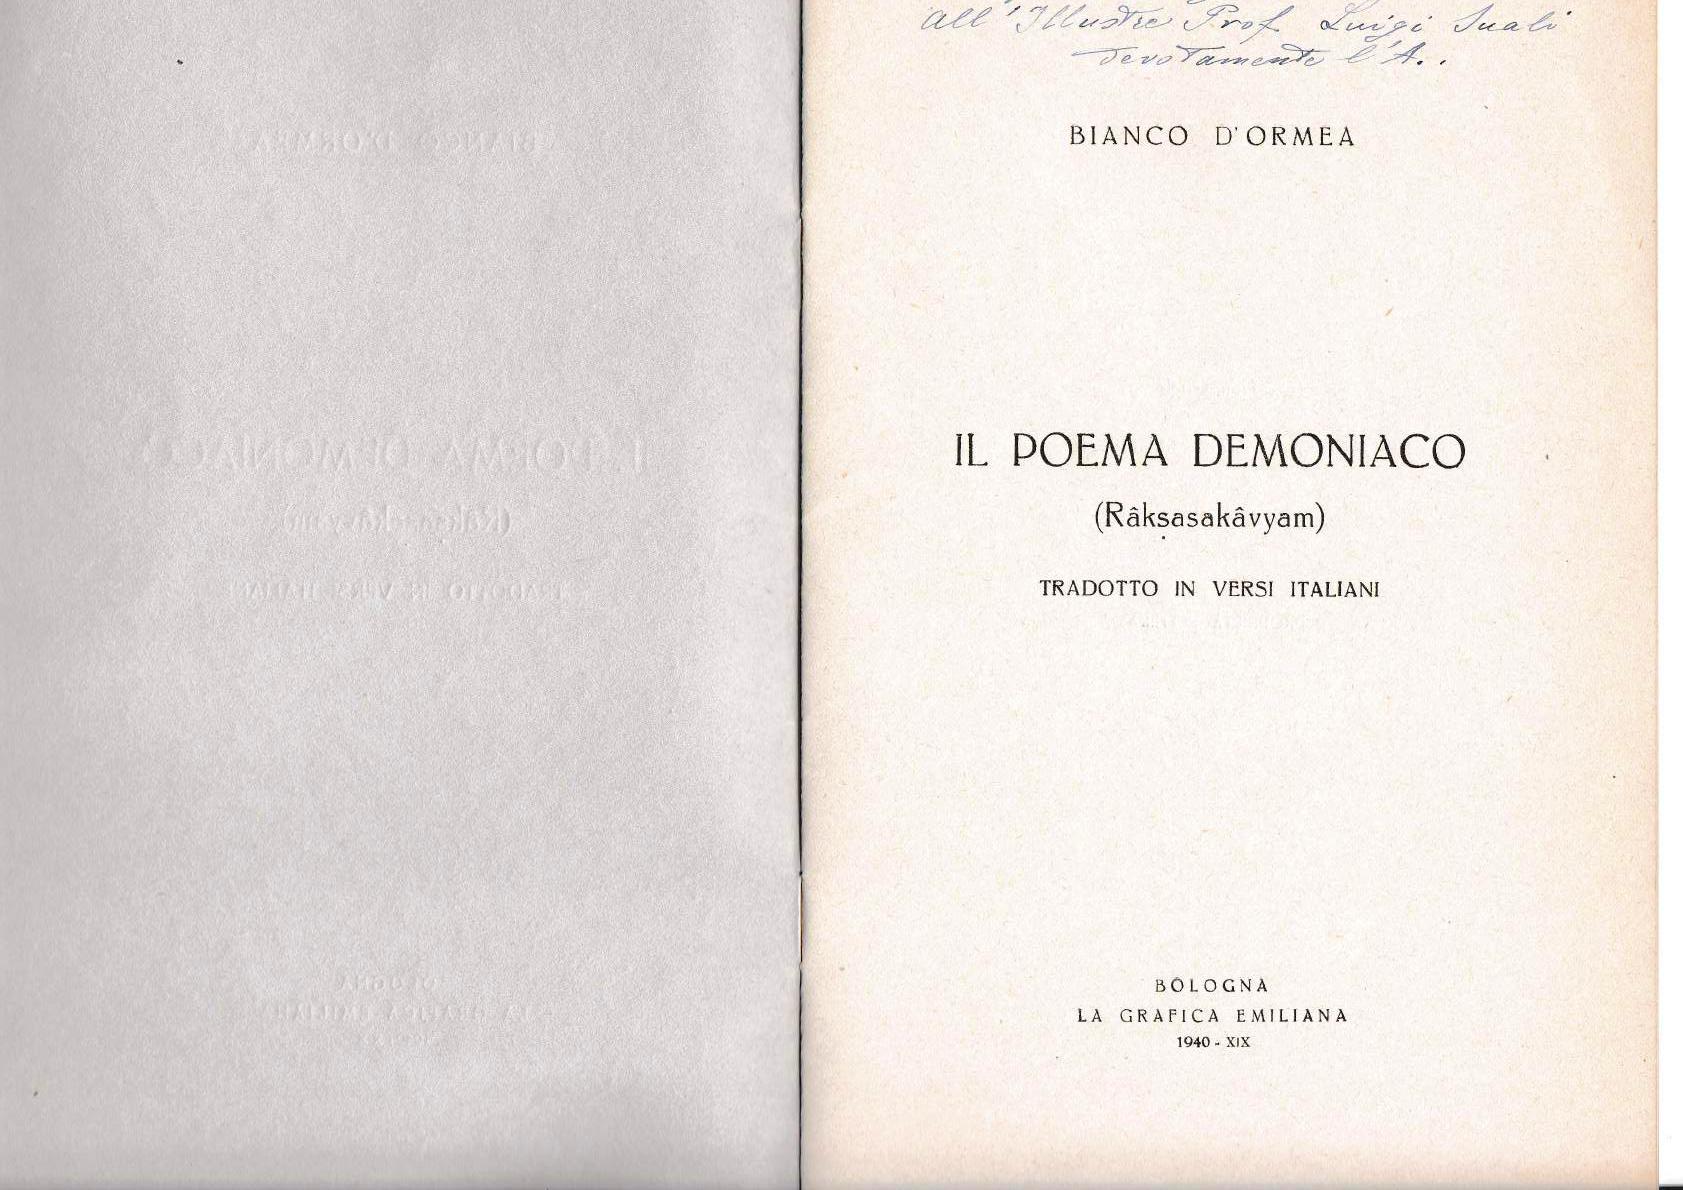 Il poema demoniaco - Bianco D'Ormea (1940)